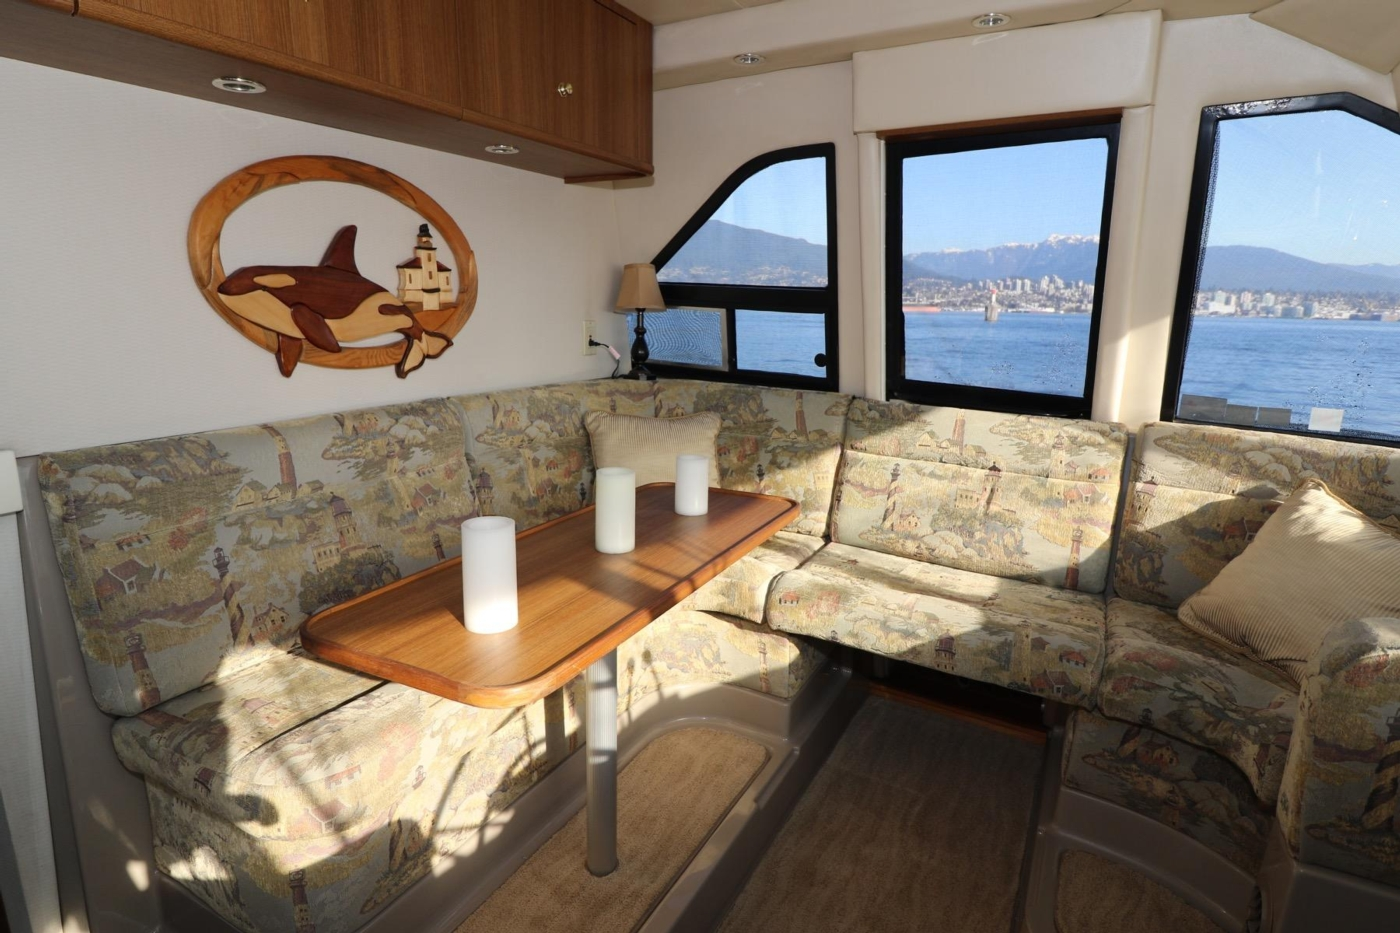 1999 Bayliner 5788 Pilot House Motoryacht, Pilothouse Seating